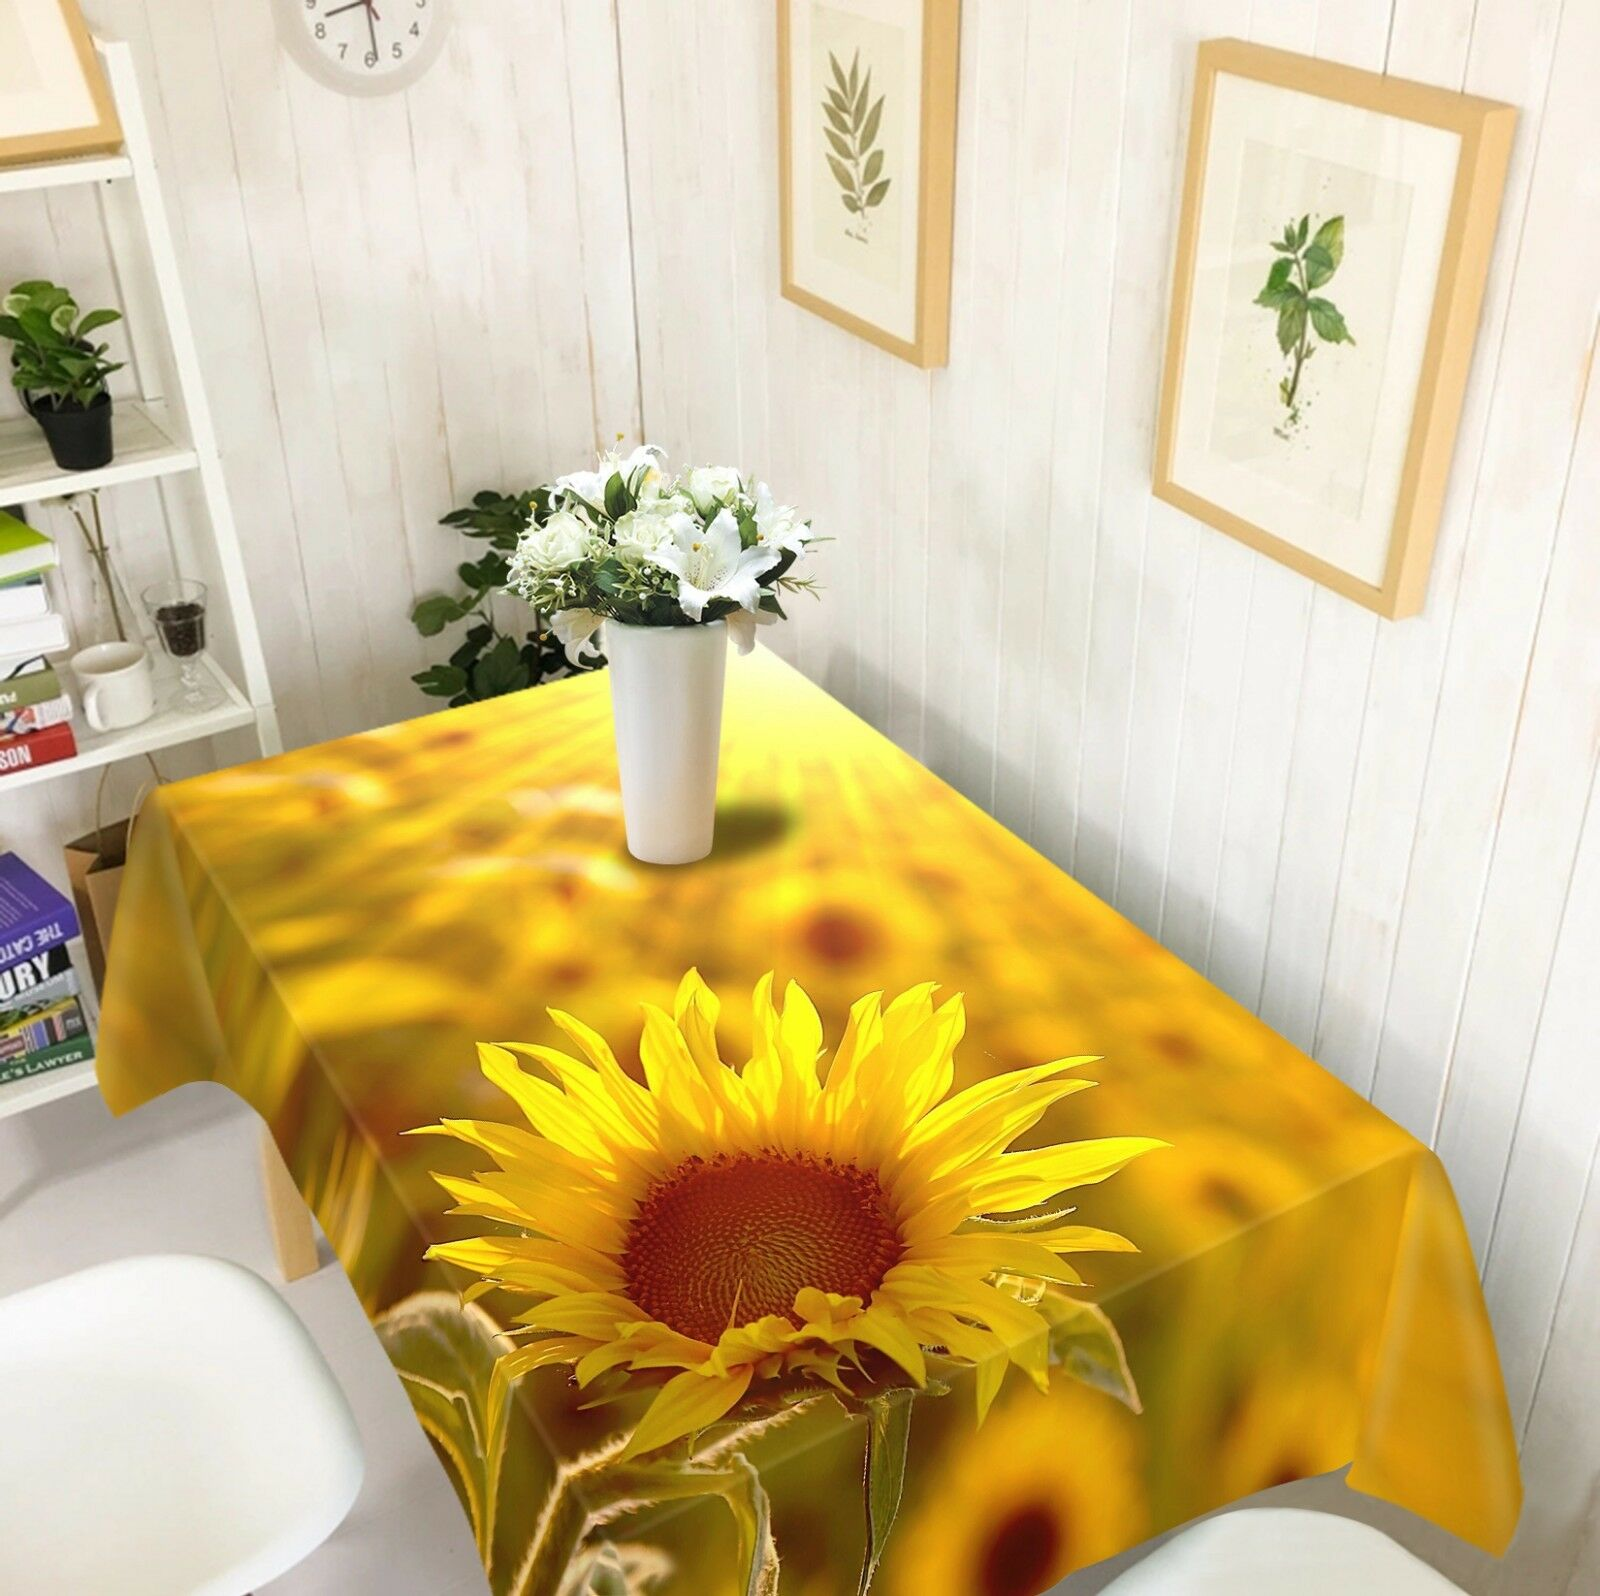 3D Sunflowers Petal 2 Tablecloth Table Cover Cloth Birthday Party Event AJ Lemon